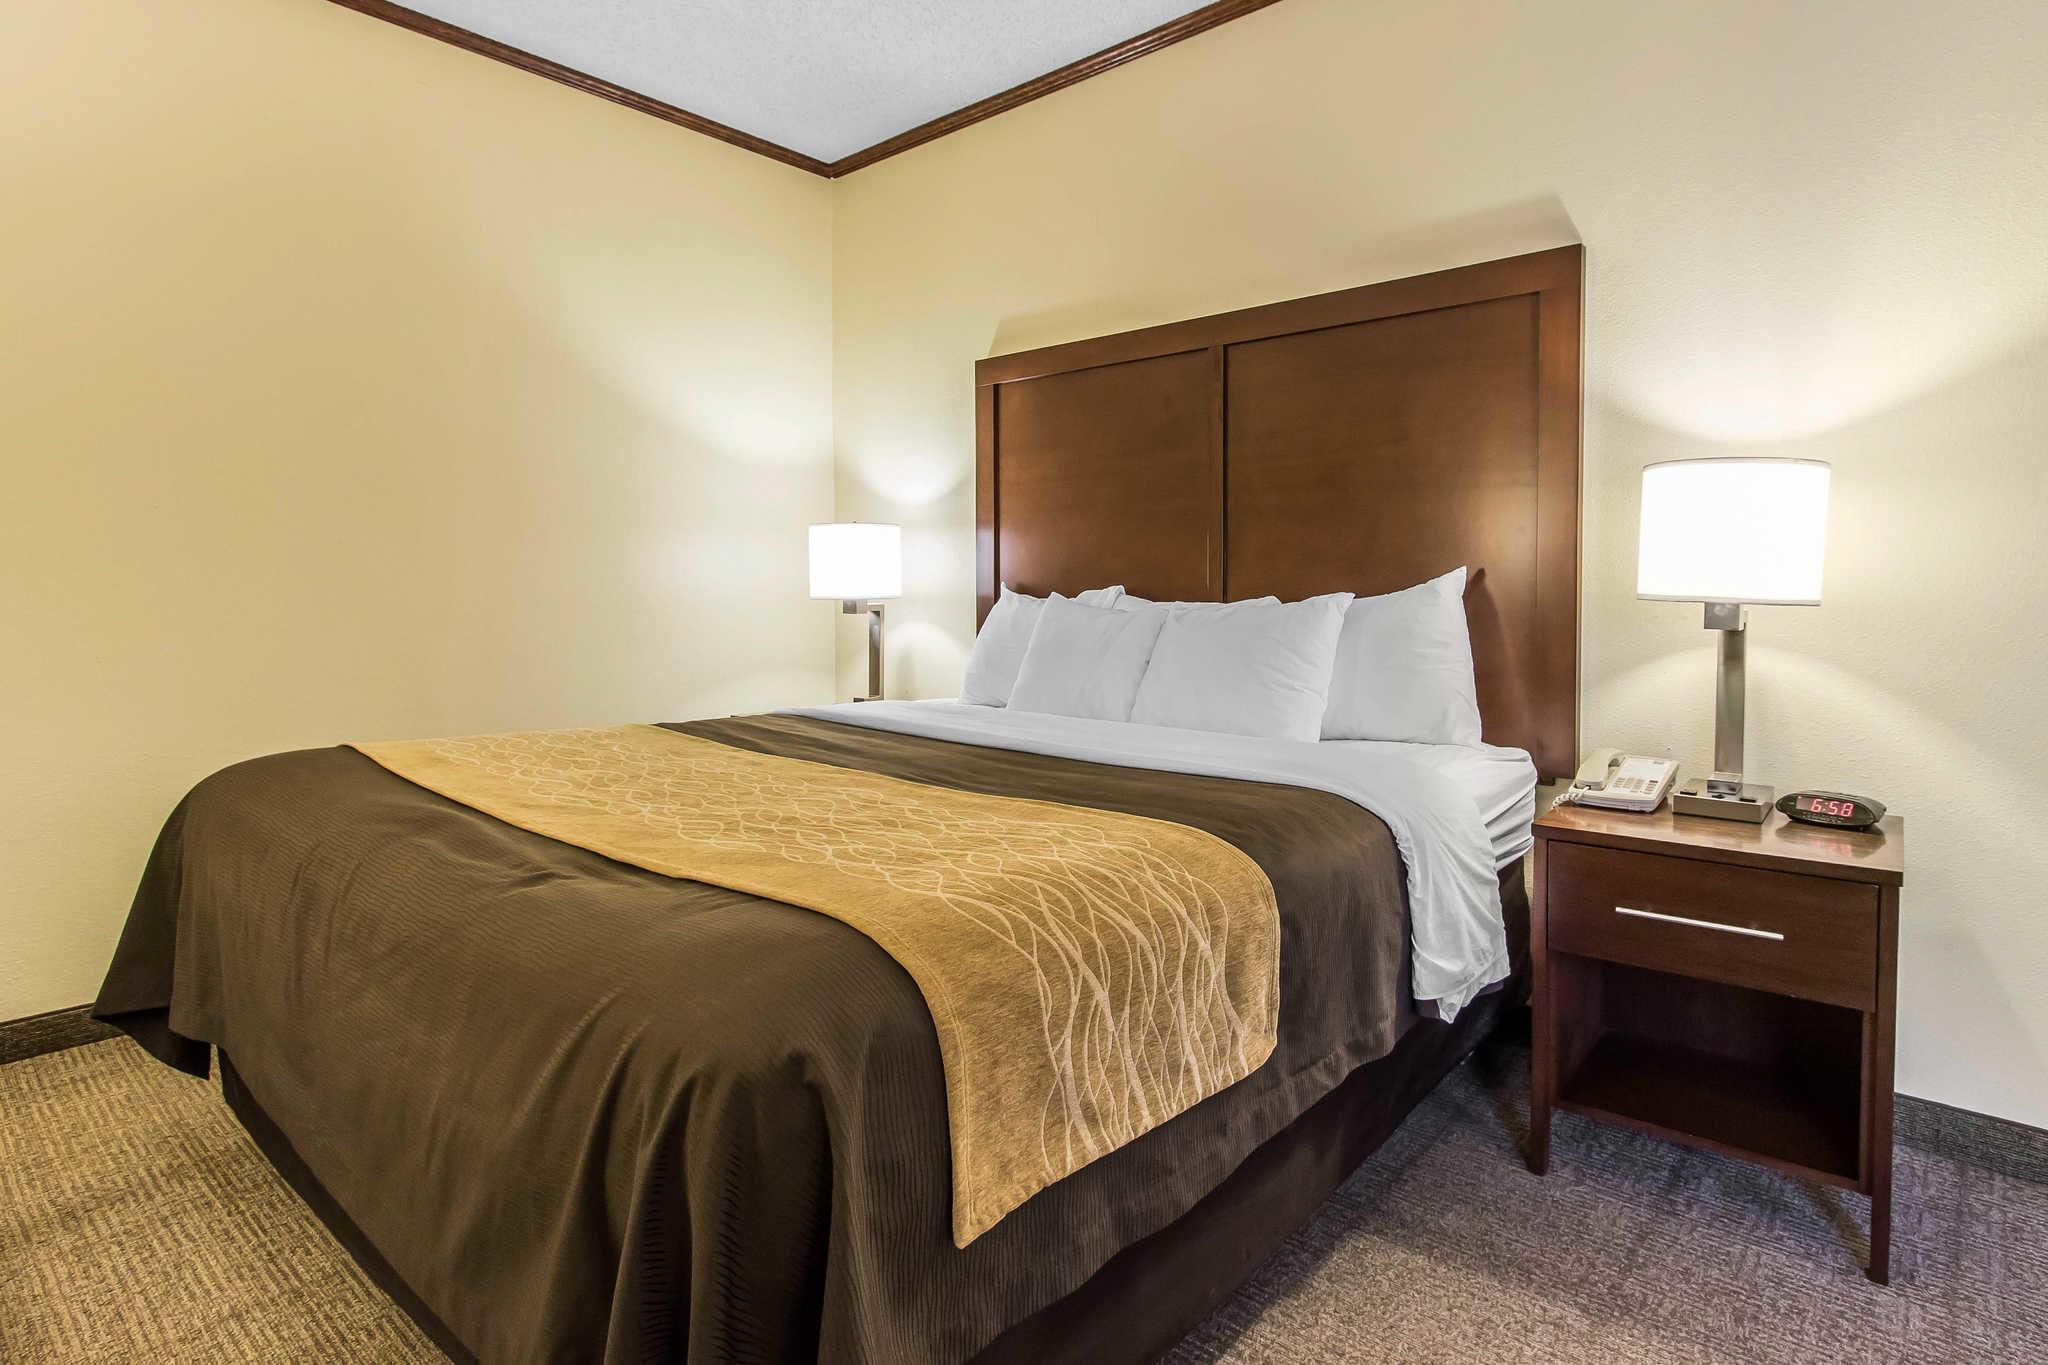 Comfort Inn & Suites Ardmore image 15